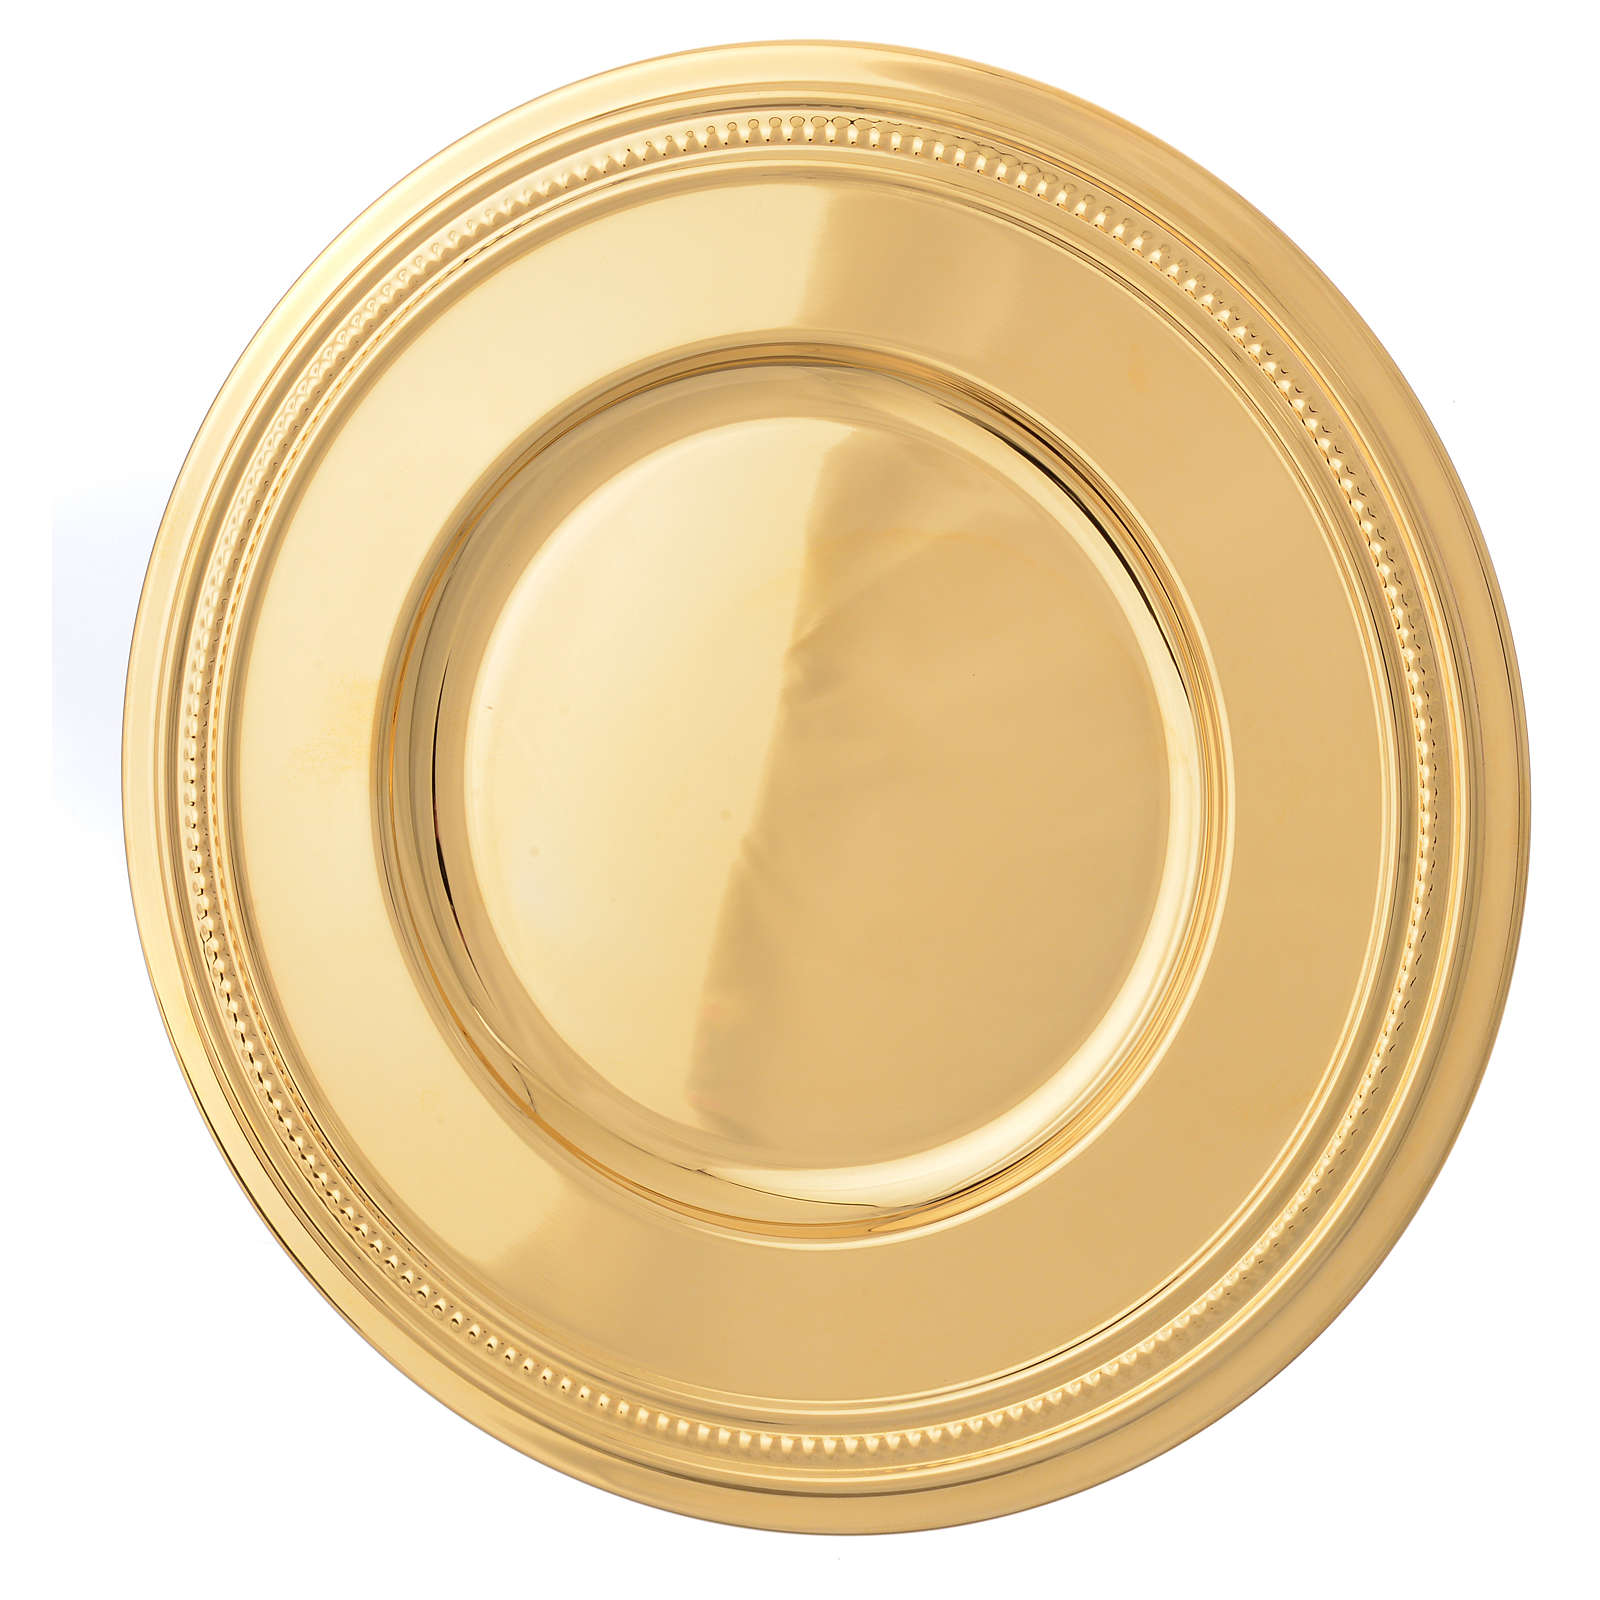 Paten in golden brass 19cm 4